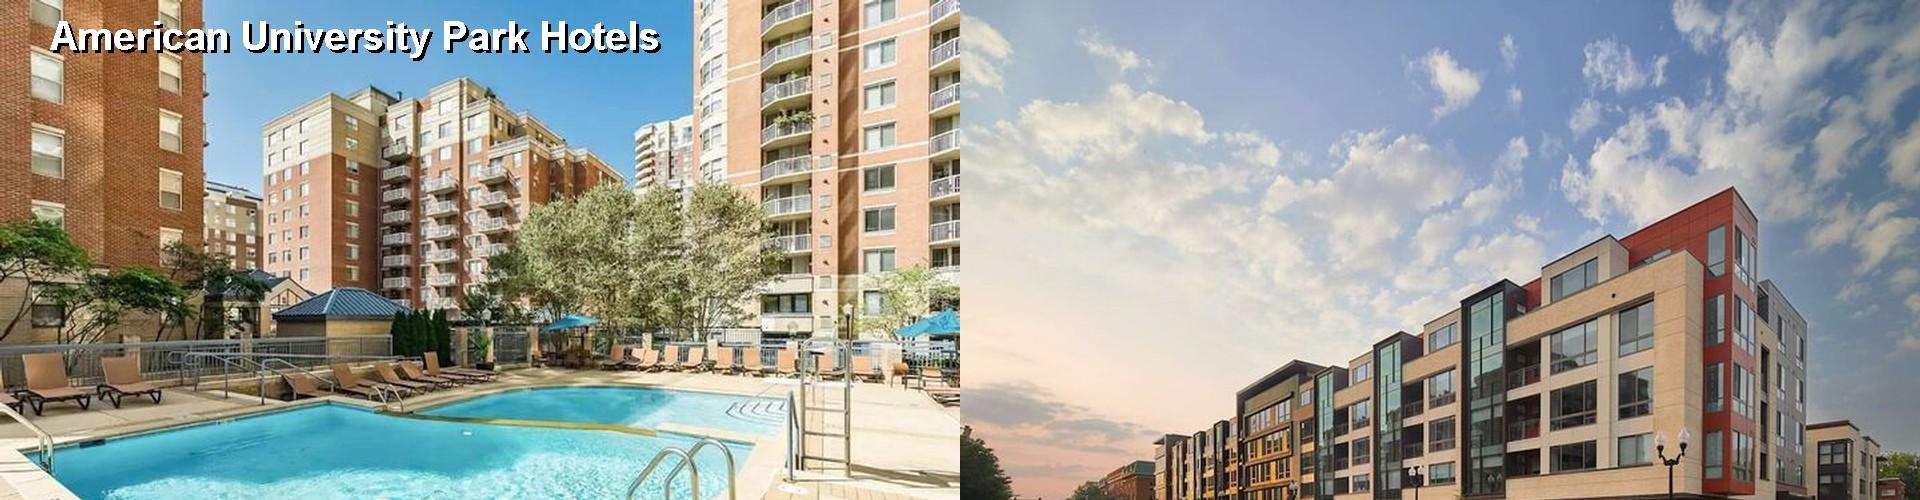 5 Best Hotels Near American University Park